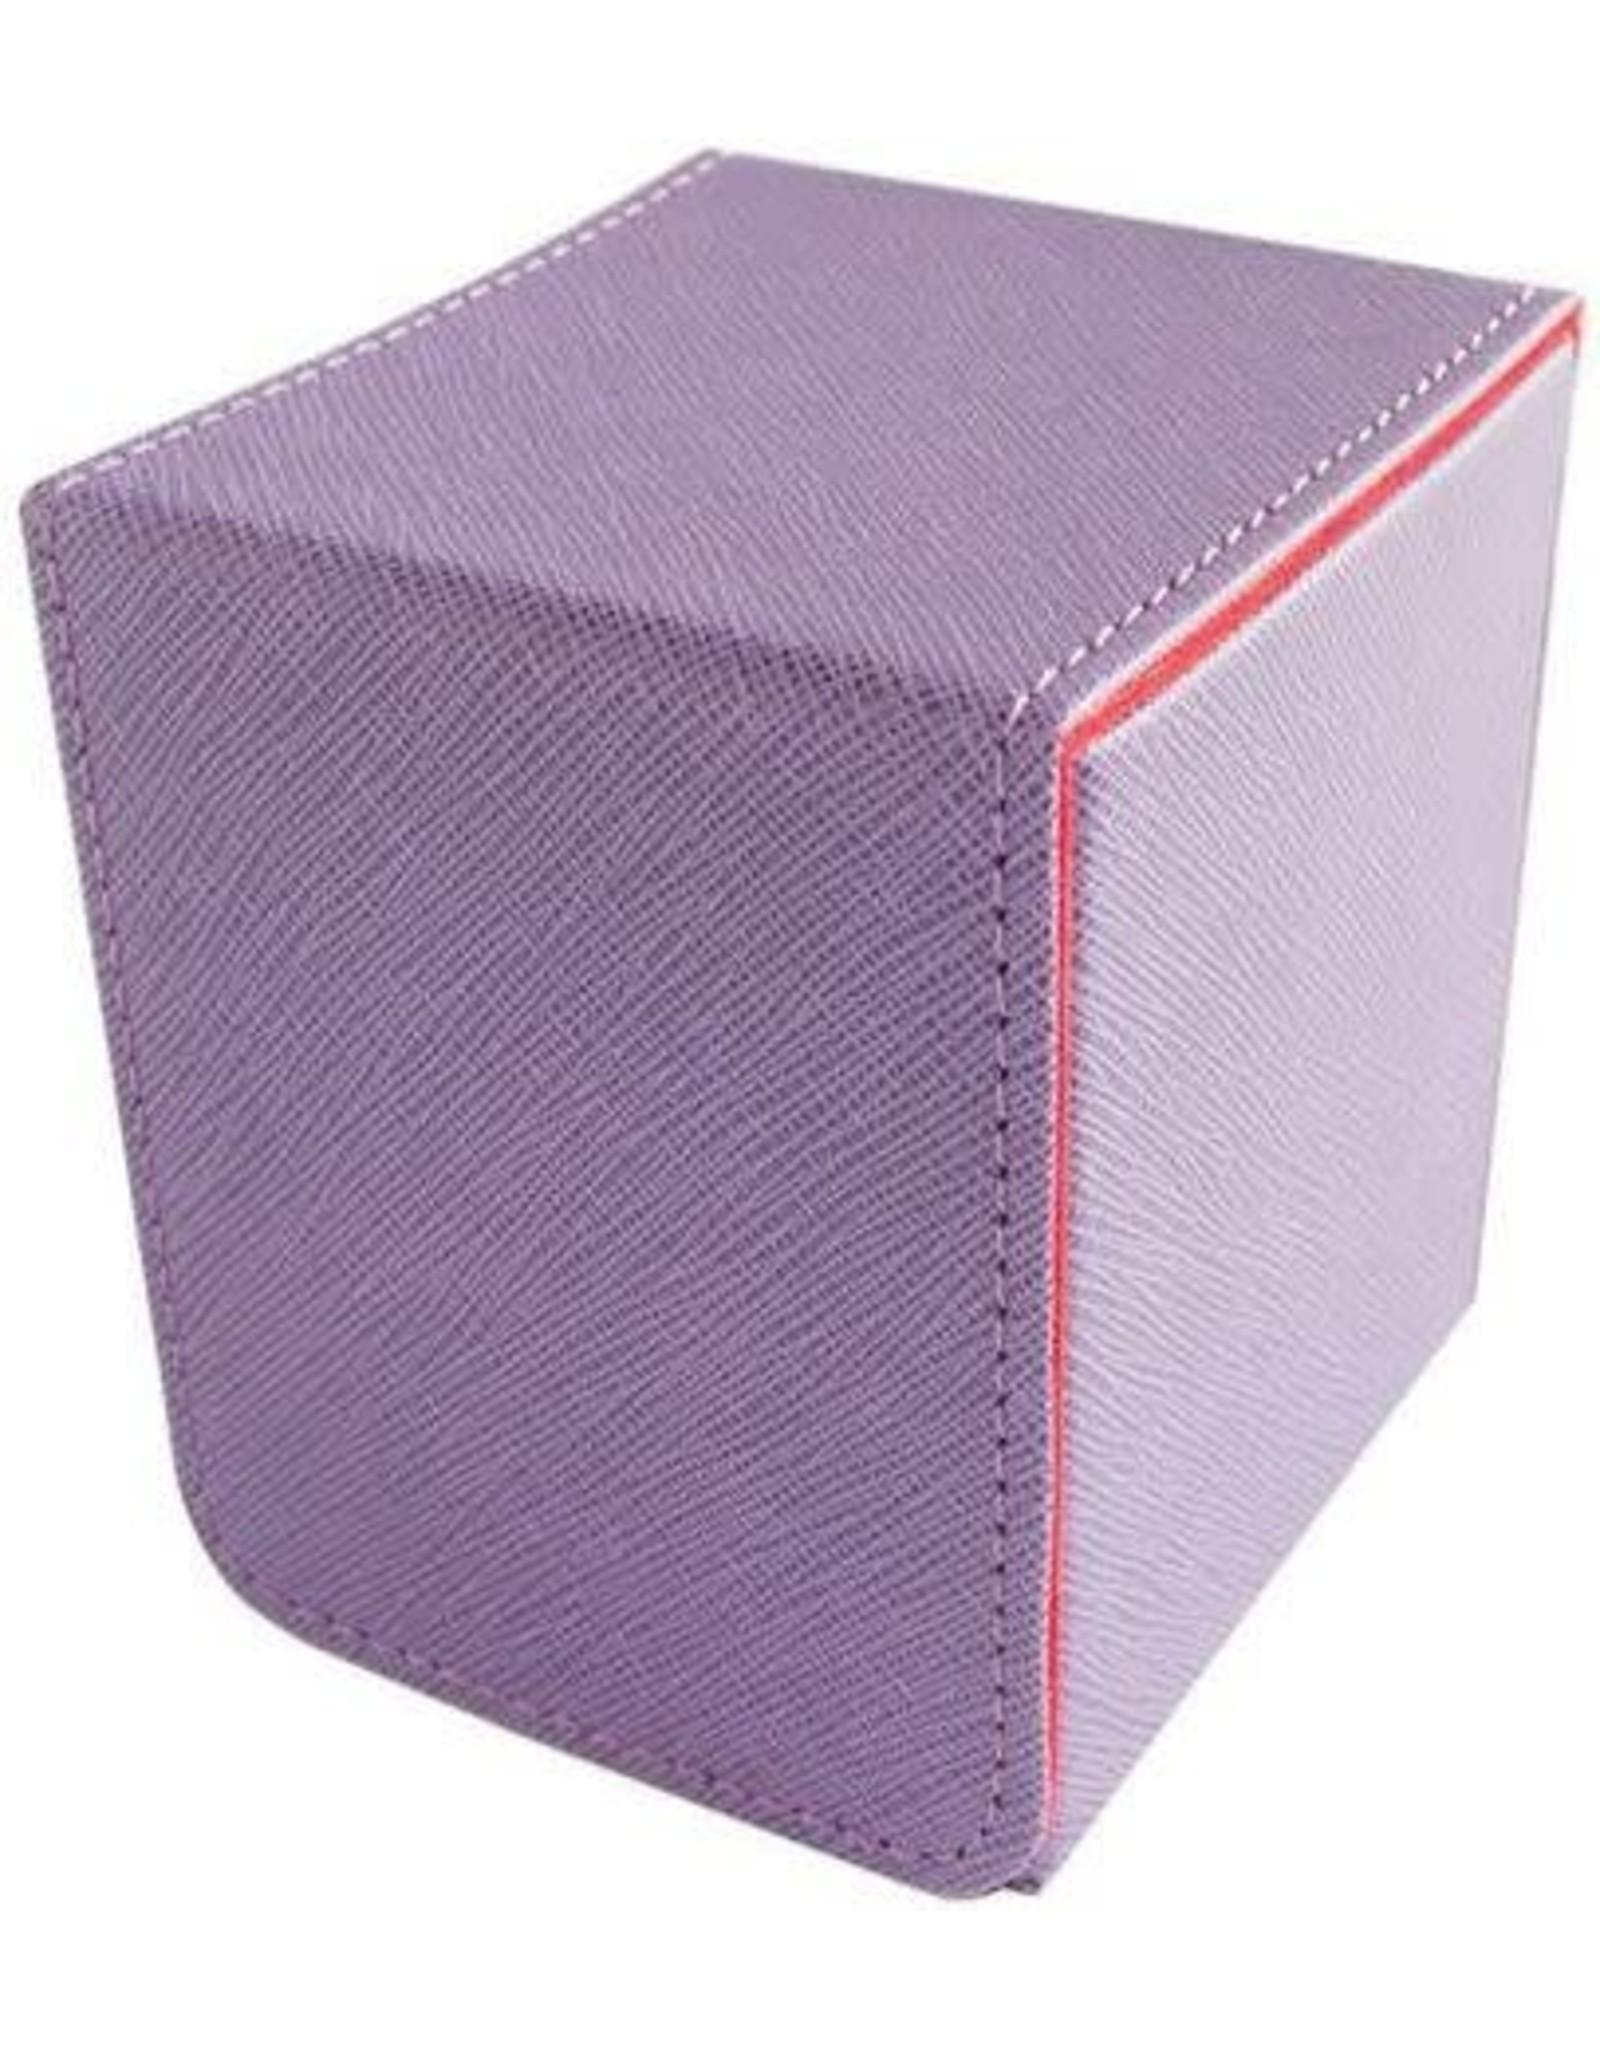 Dex Protection Dex Creation Line Small Purple 100ct